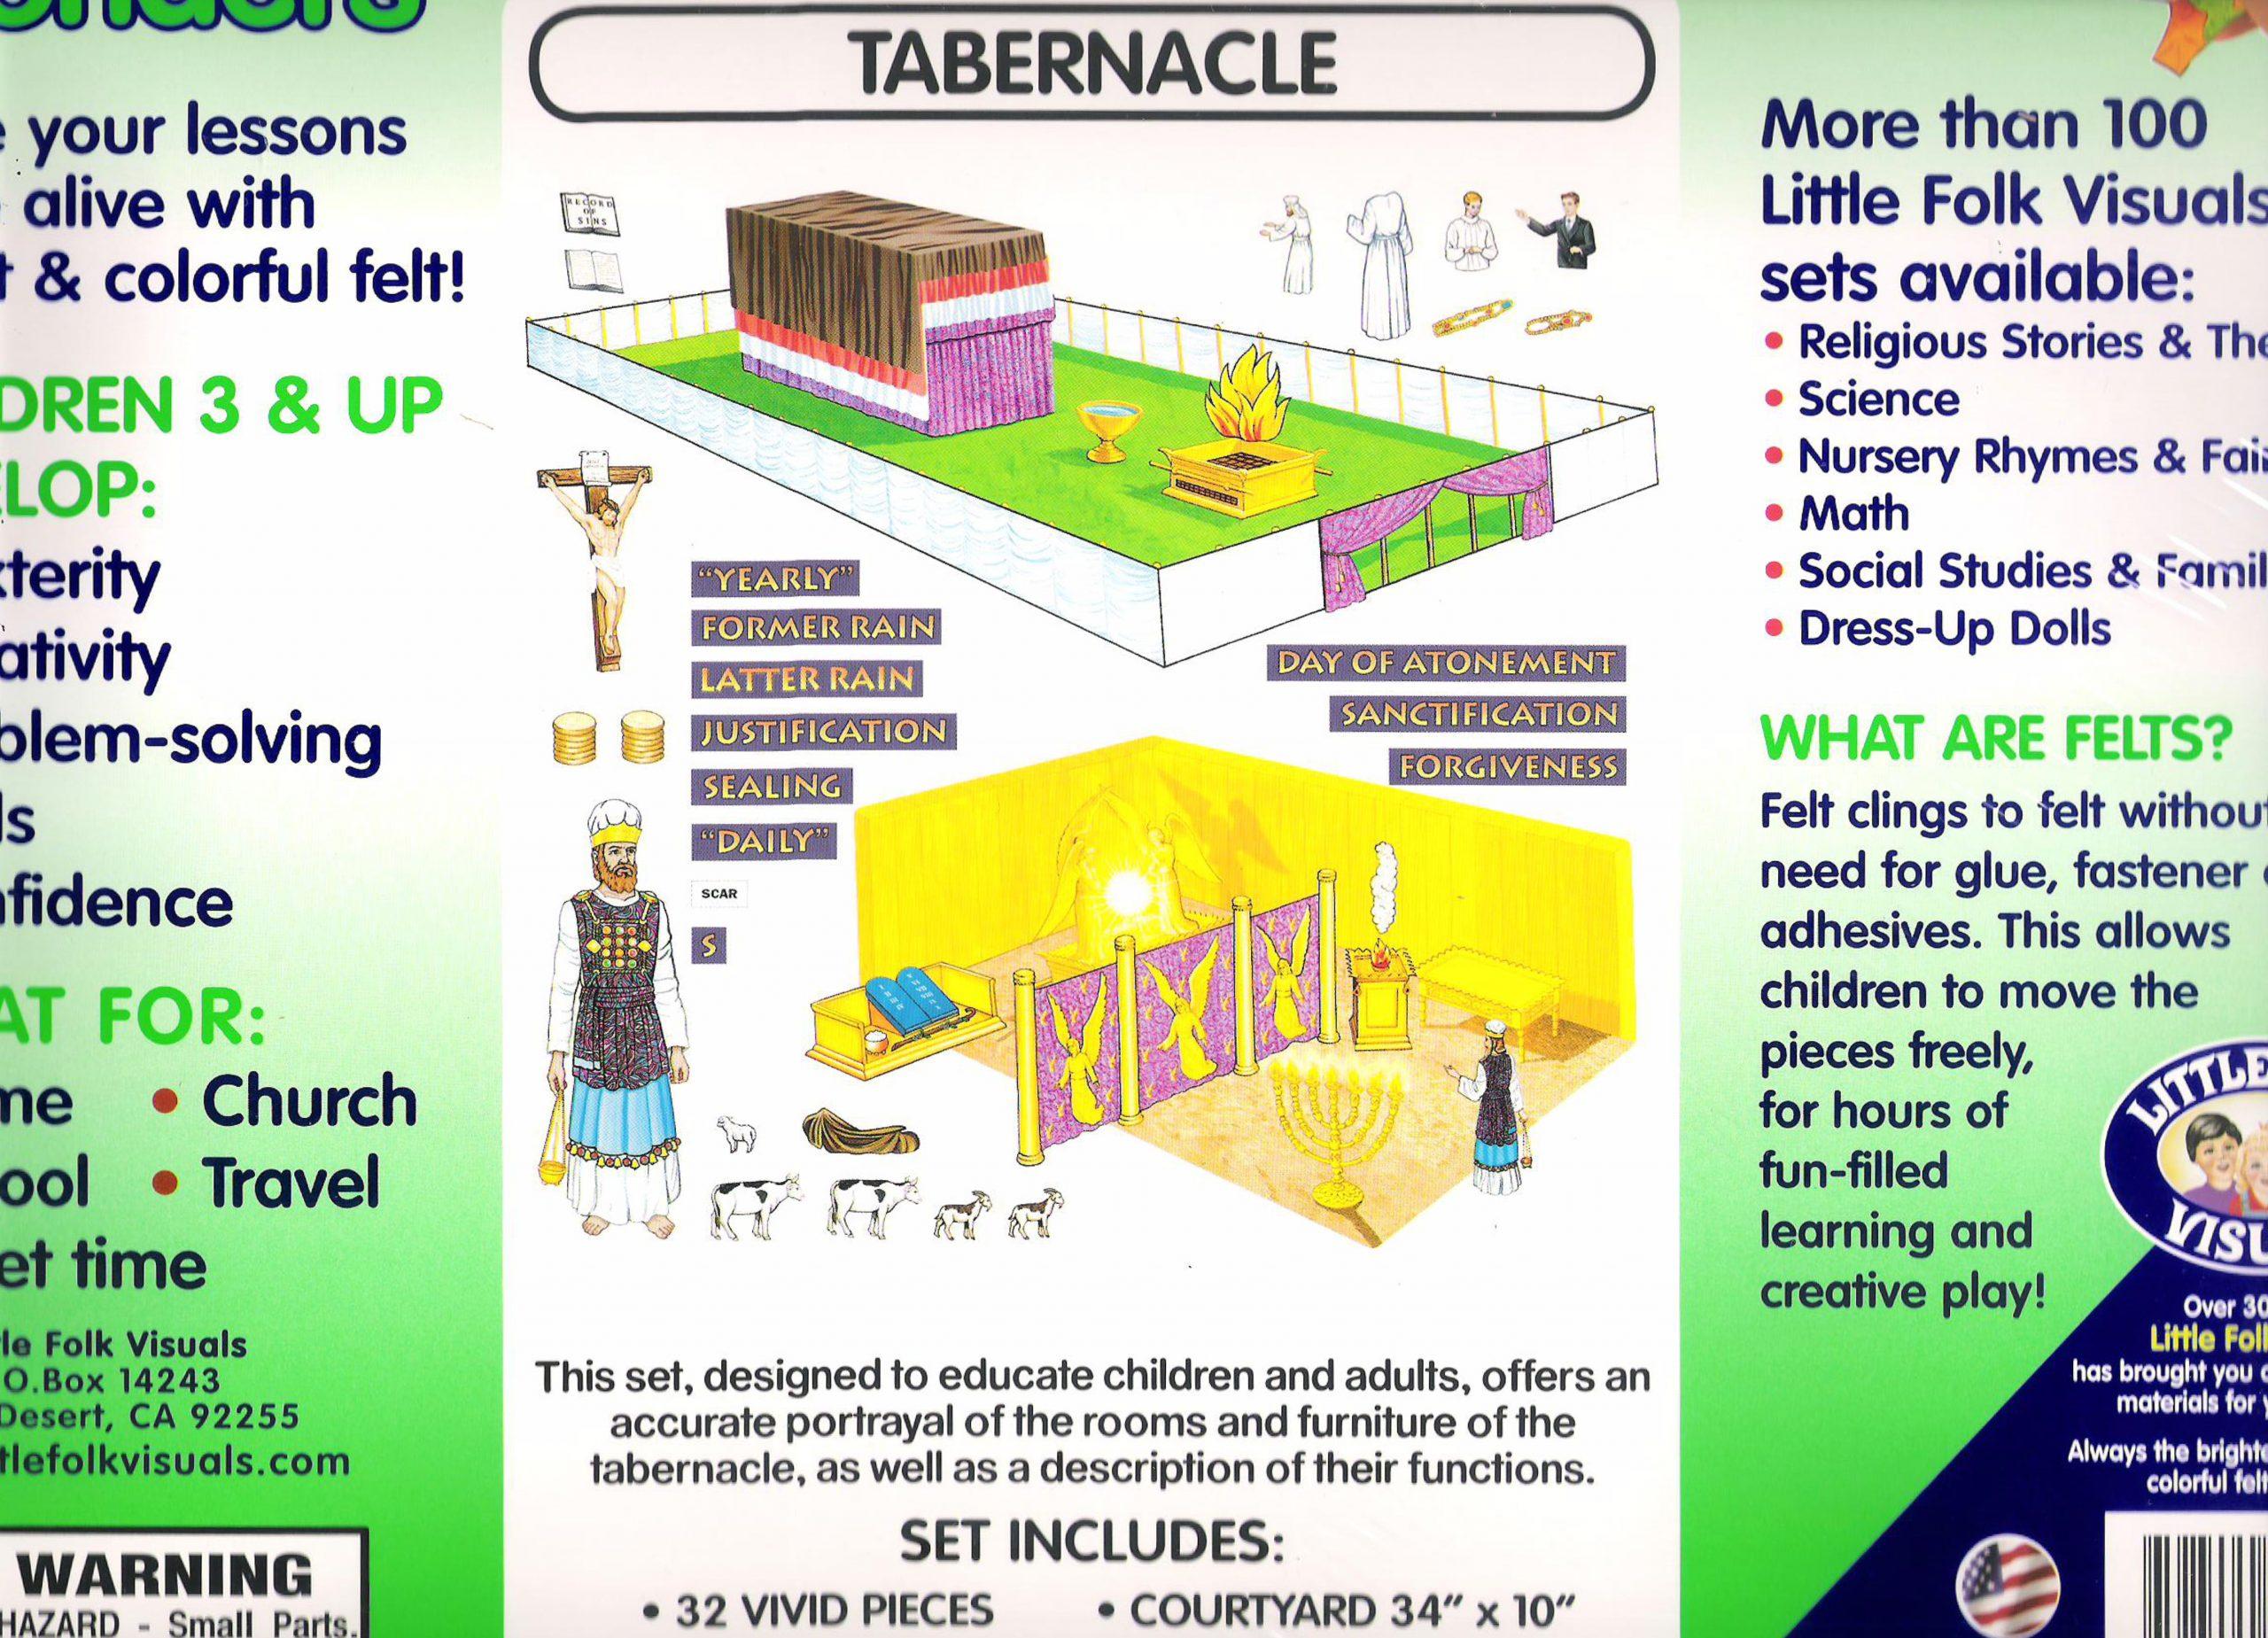 Pre-Cut Tabernacle